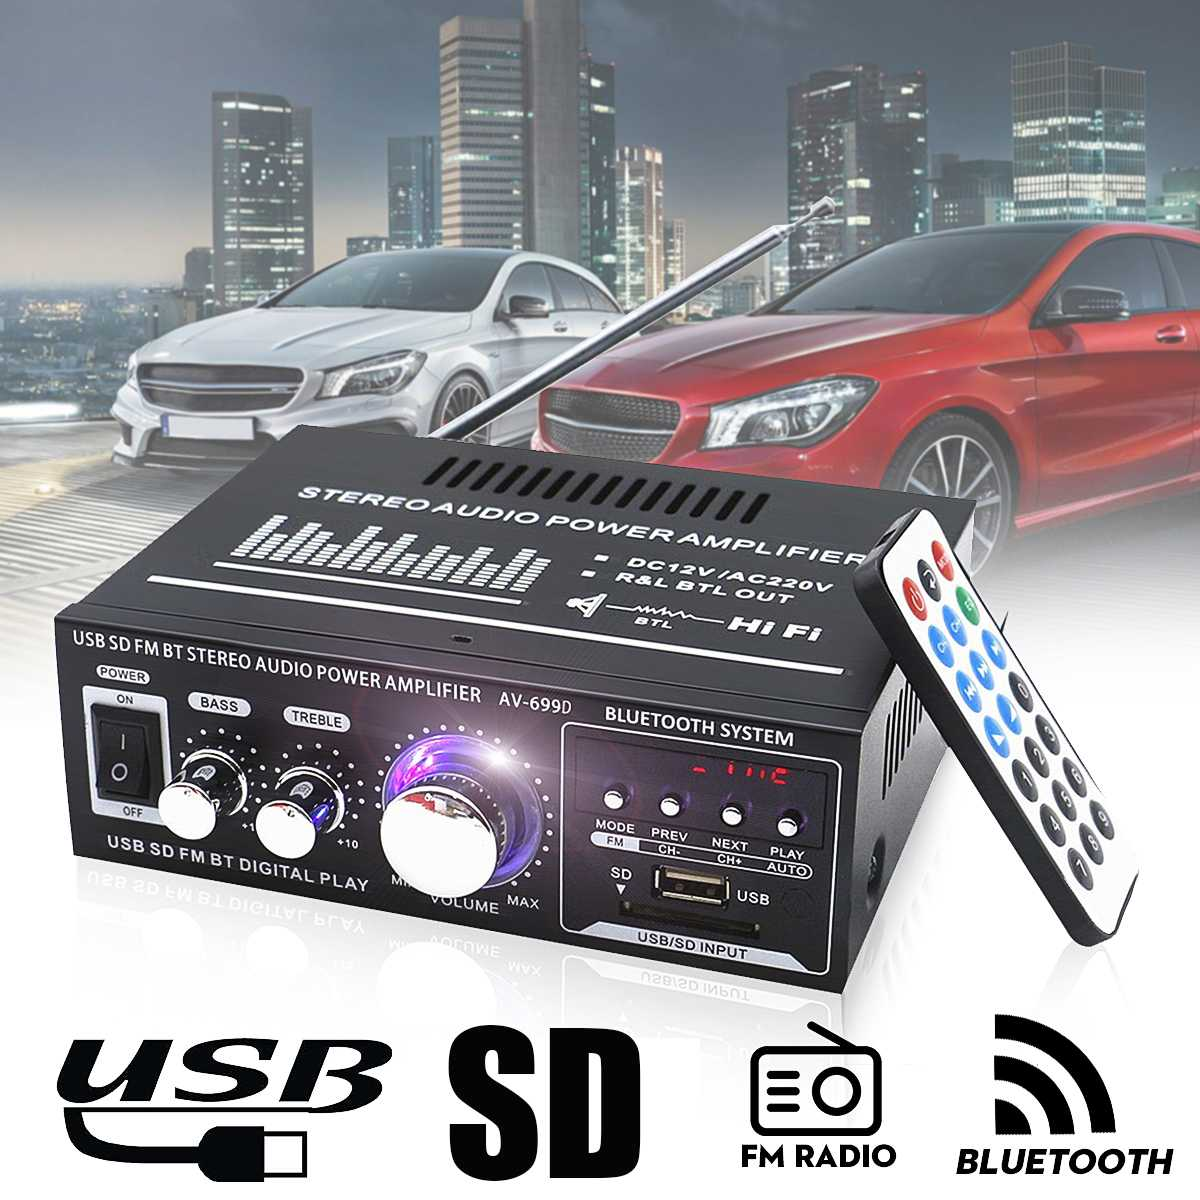 Mini Hi-Fi 600W 2 CH Stereo Audio Power Amplifier USB SD FM for Car Auto